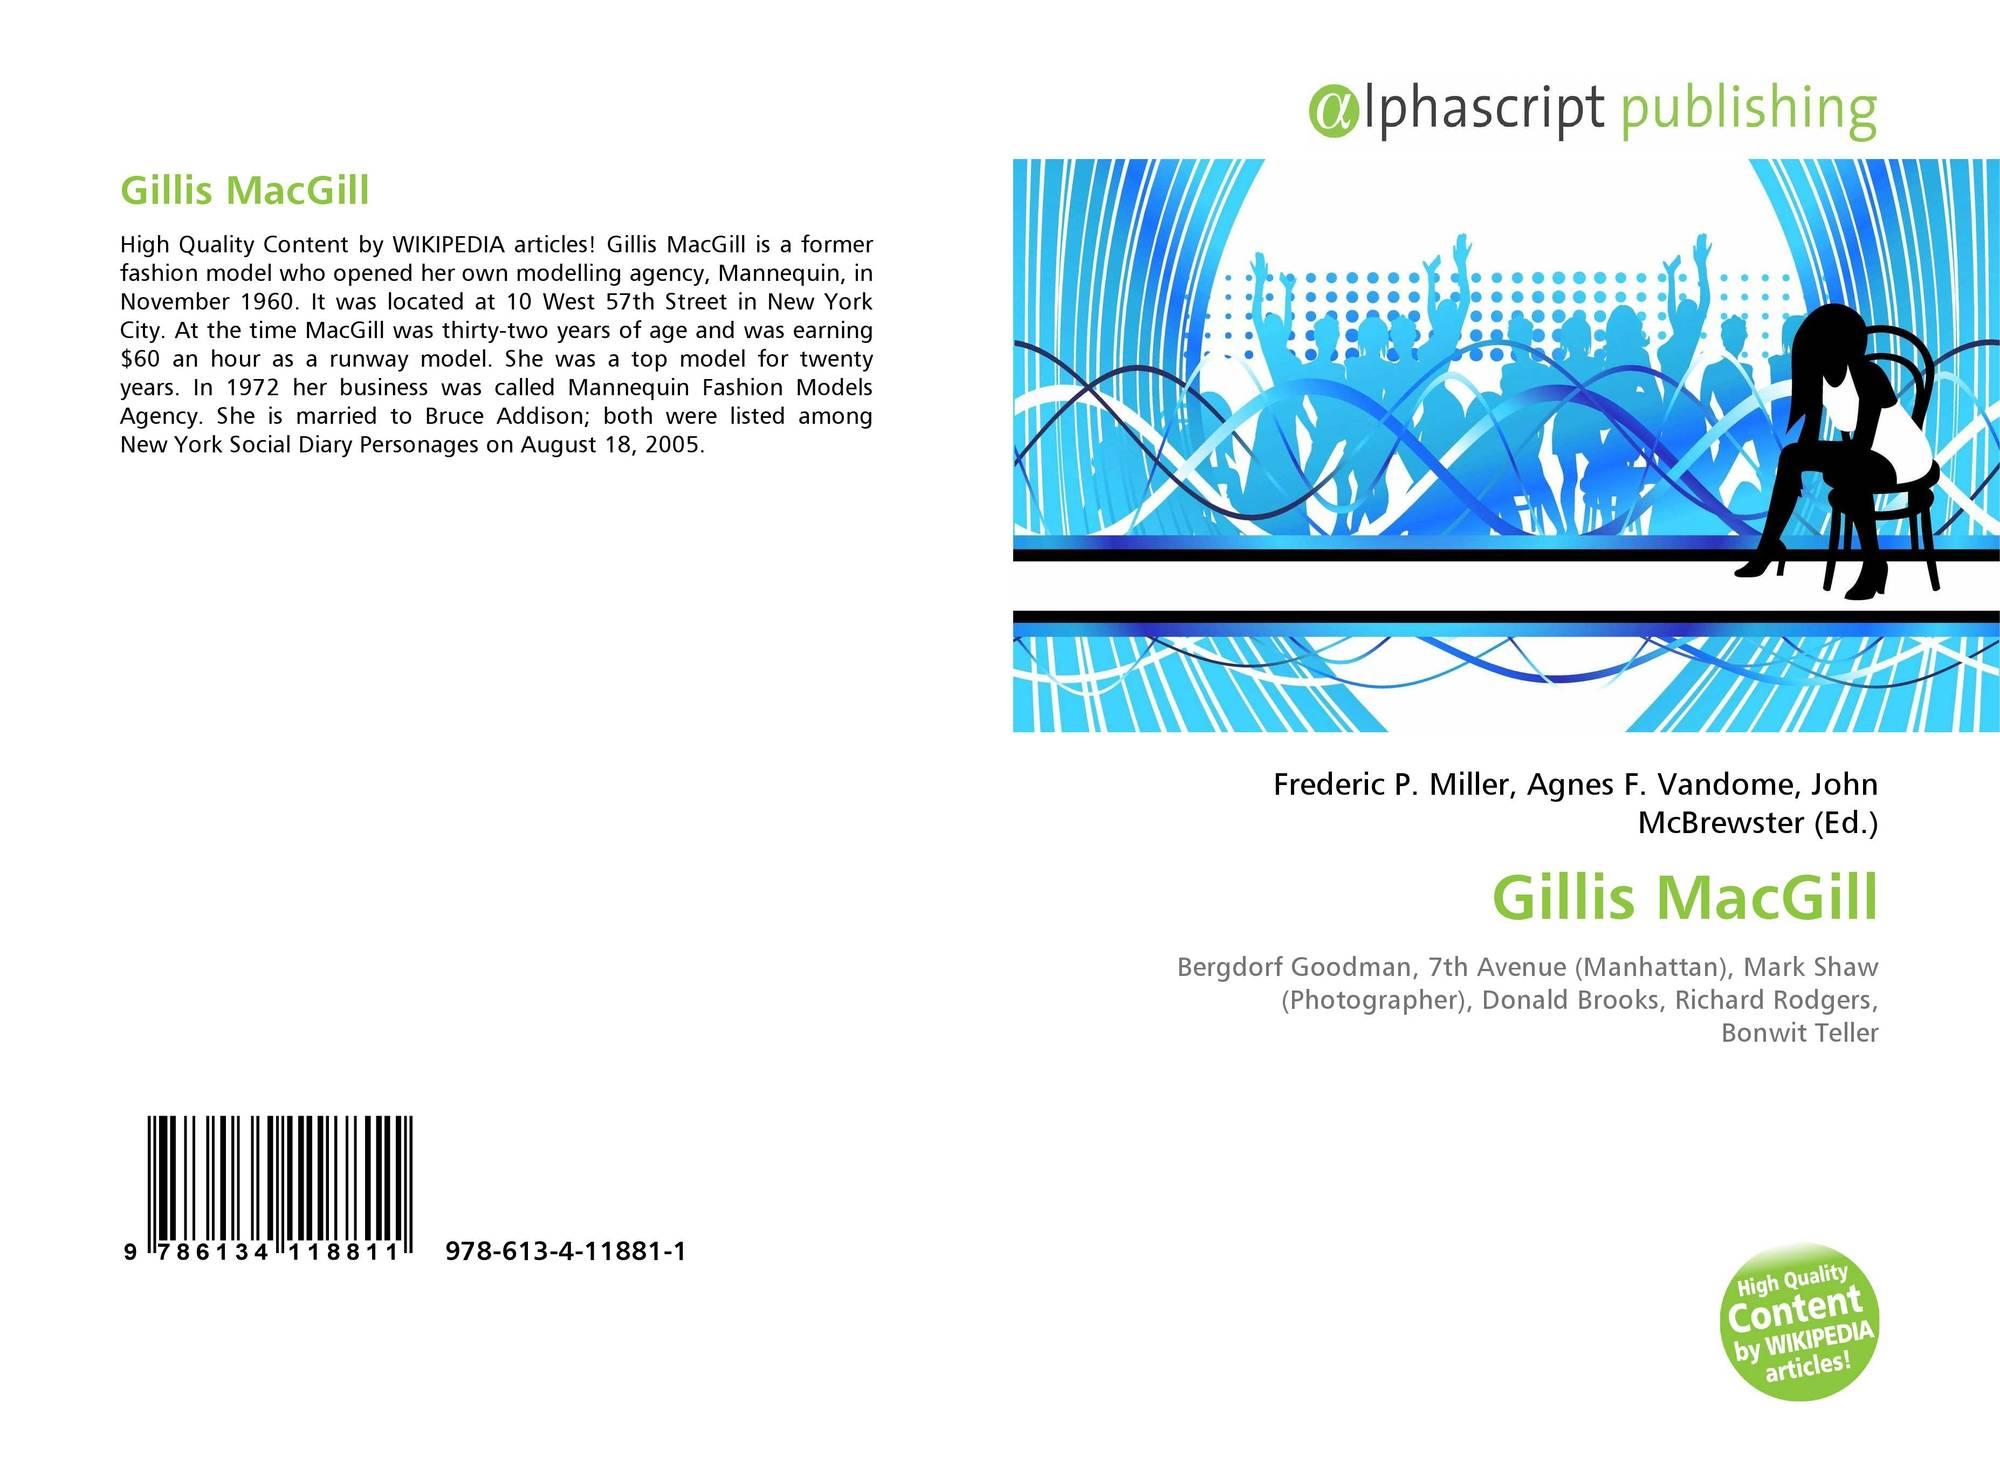 Gillis MacGill